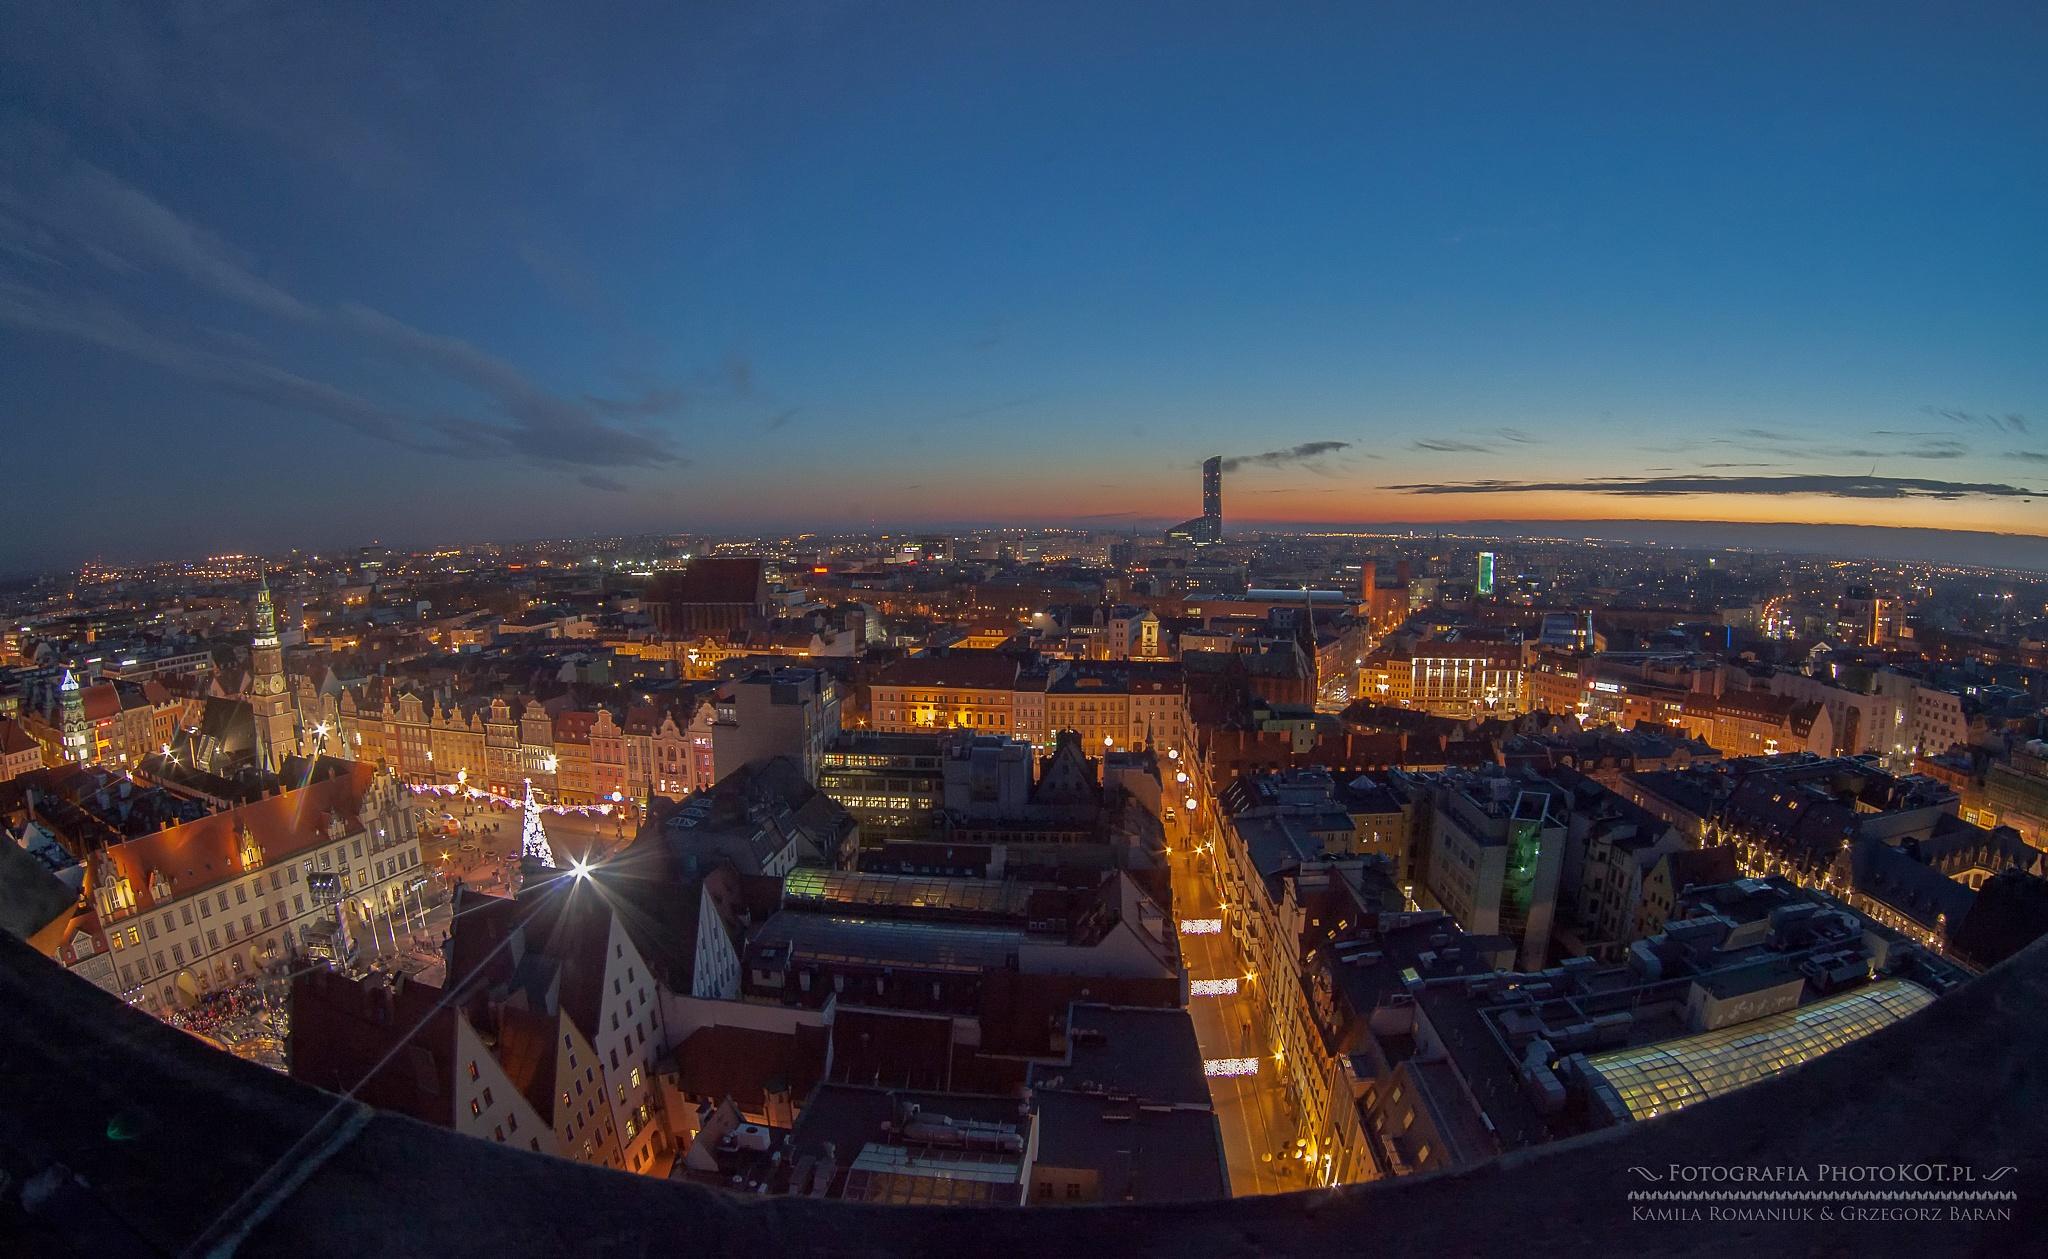 Wroclaw 2016 by Grzegorz Baran